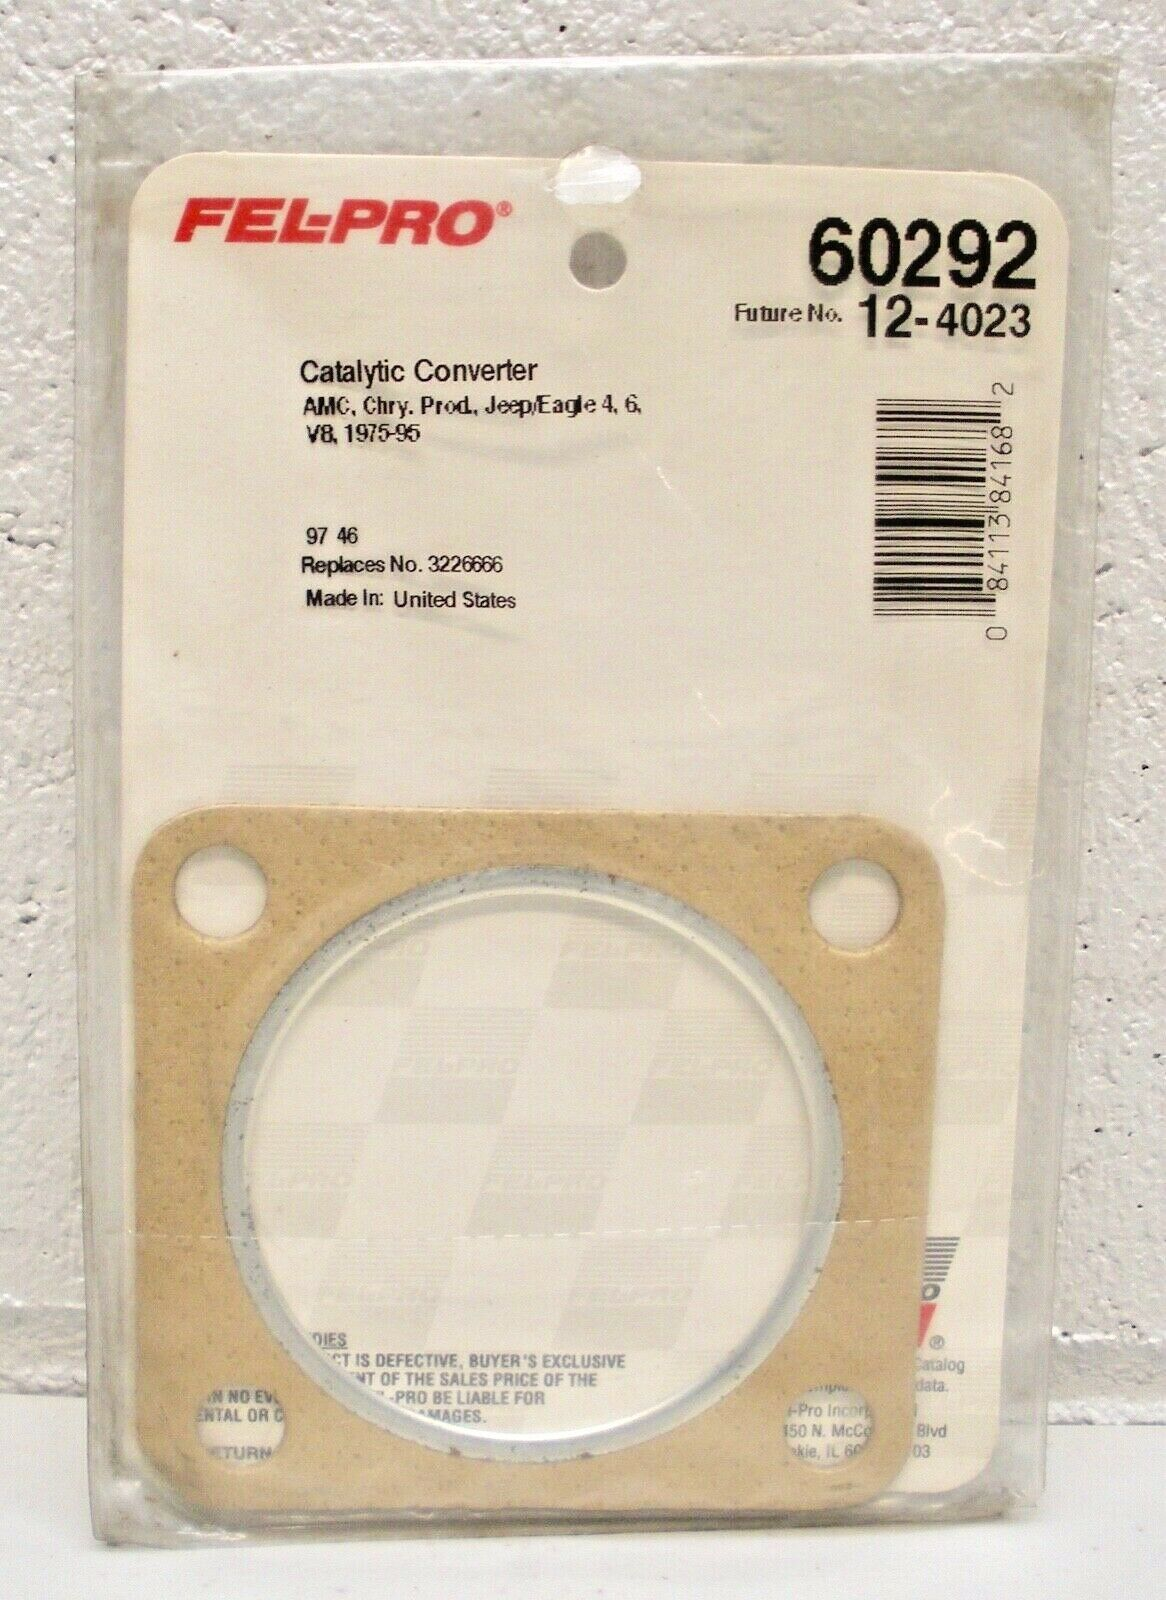 Exhaust Pipe Flange Gasket Fel-Pro 60292